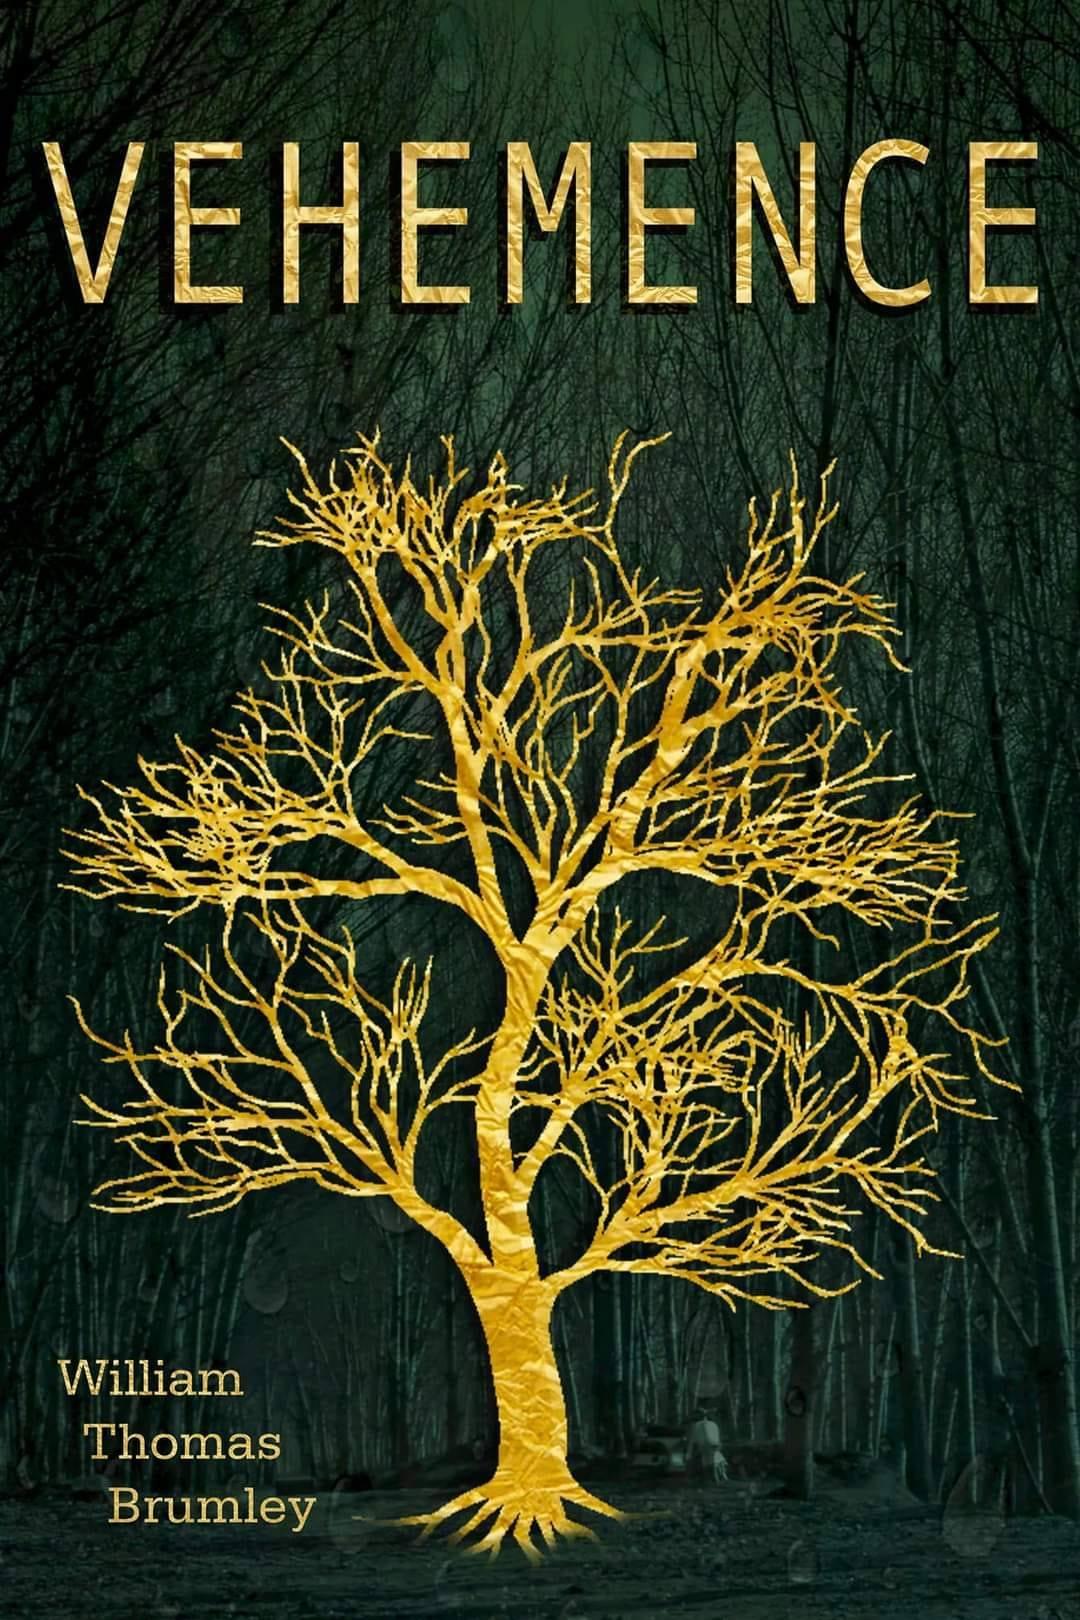 Vehemence: Tree of Treason by William Thomas Brumley